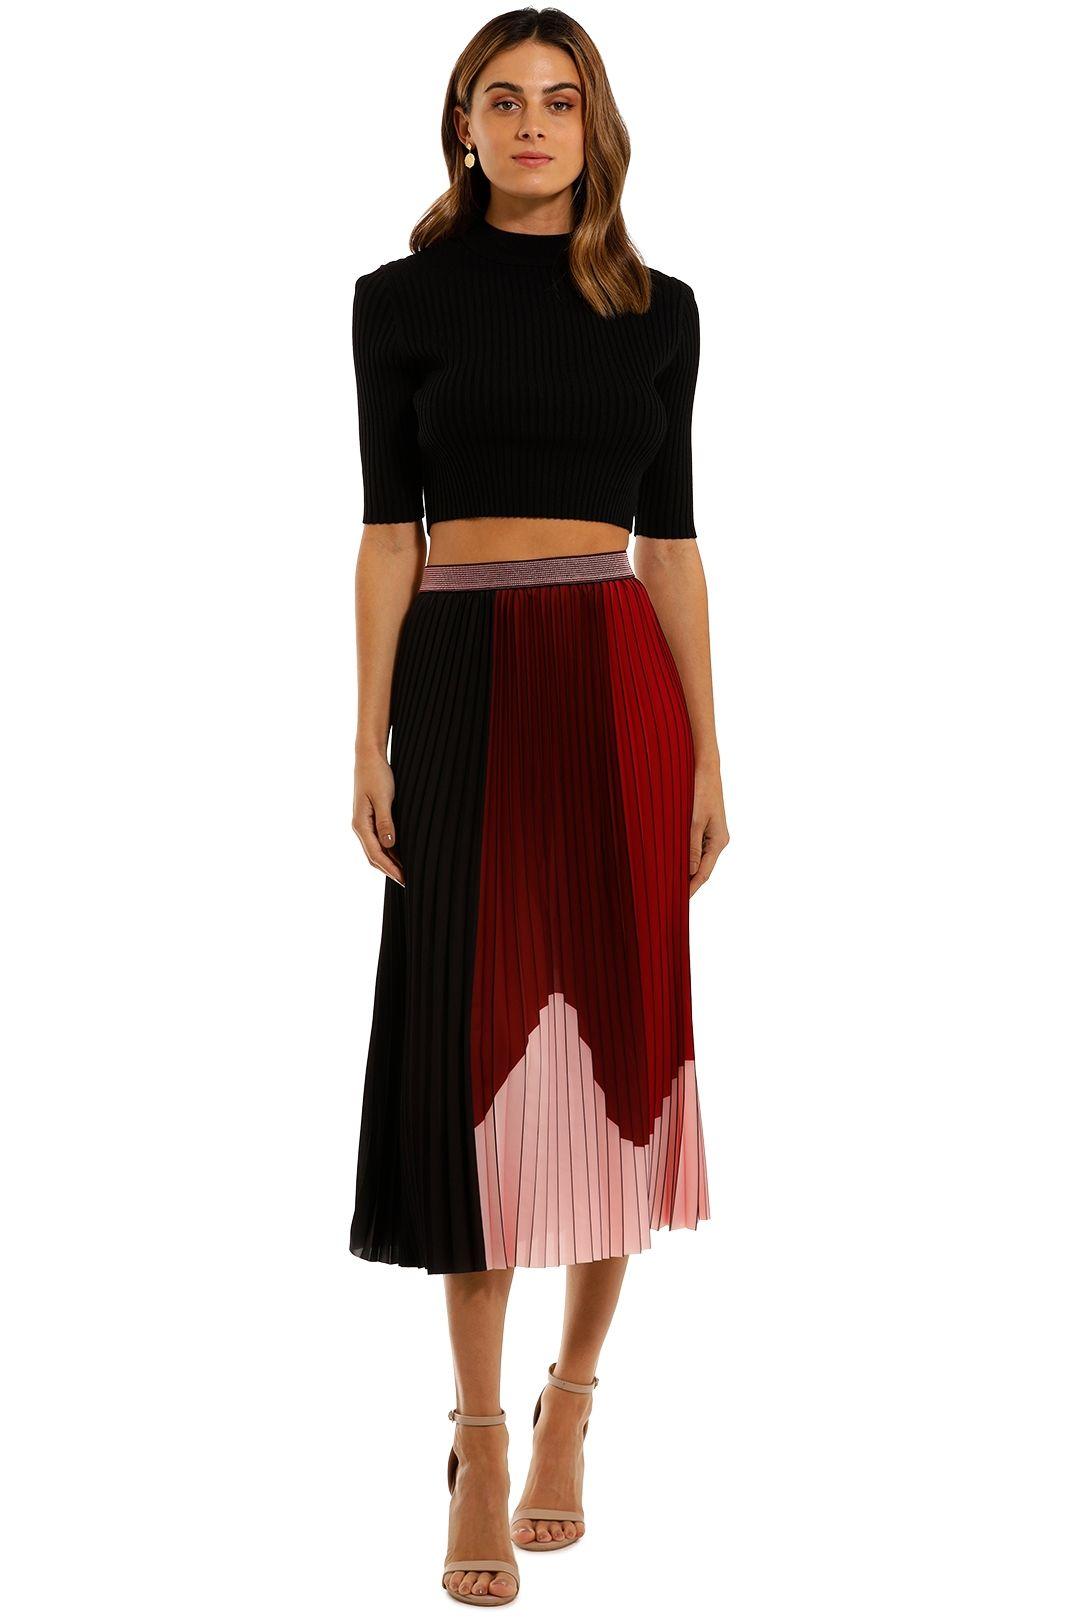 COOP Pleat Emotion Skirt Wine Mix